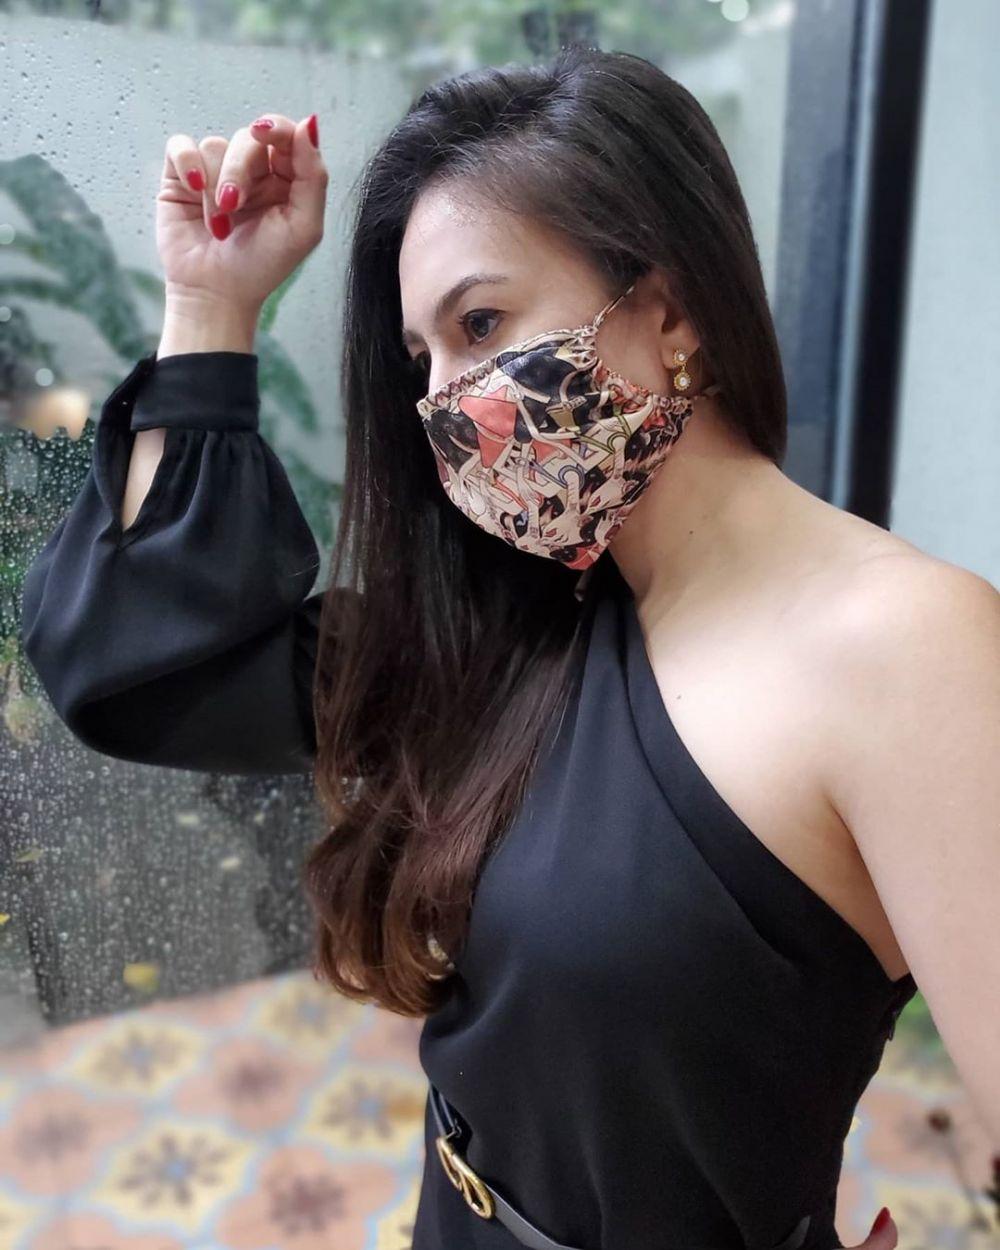 Seleb dandan nyentriki memakai masker © 2020 brilio.net